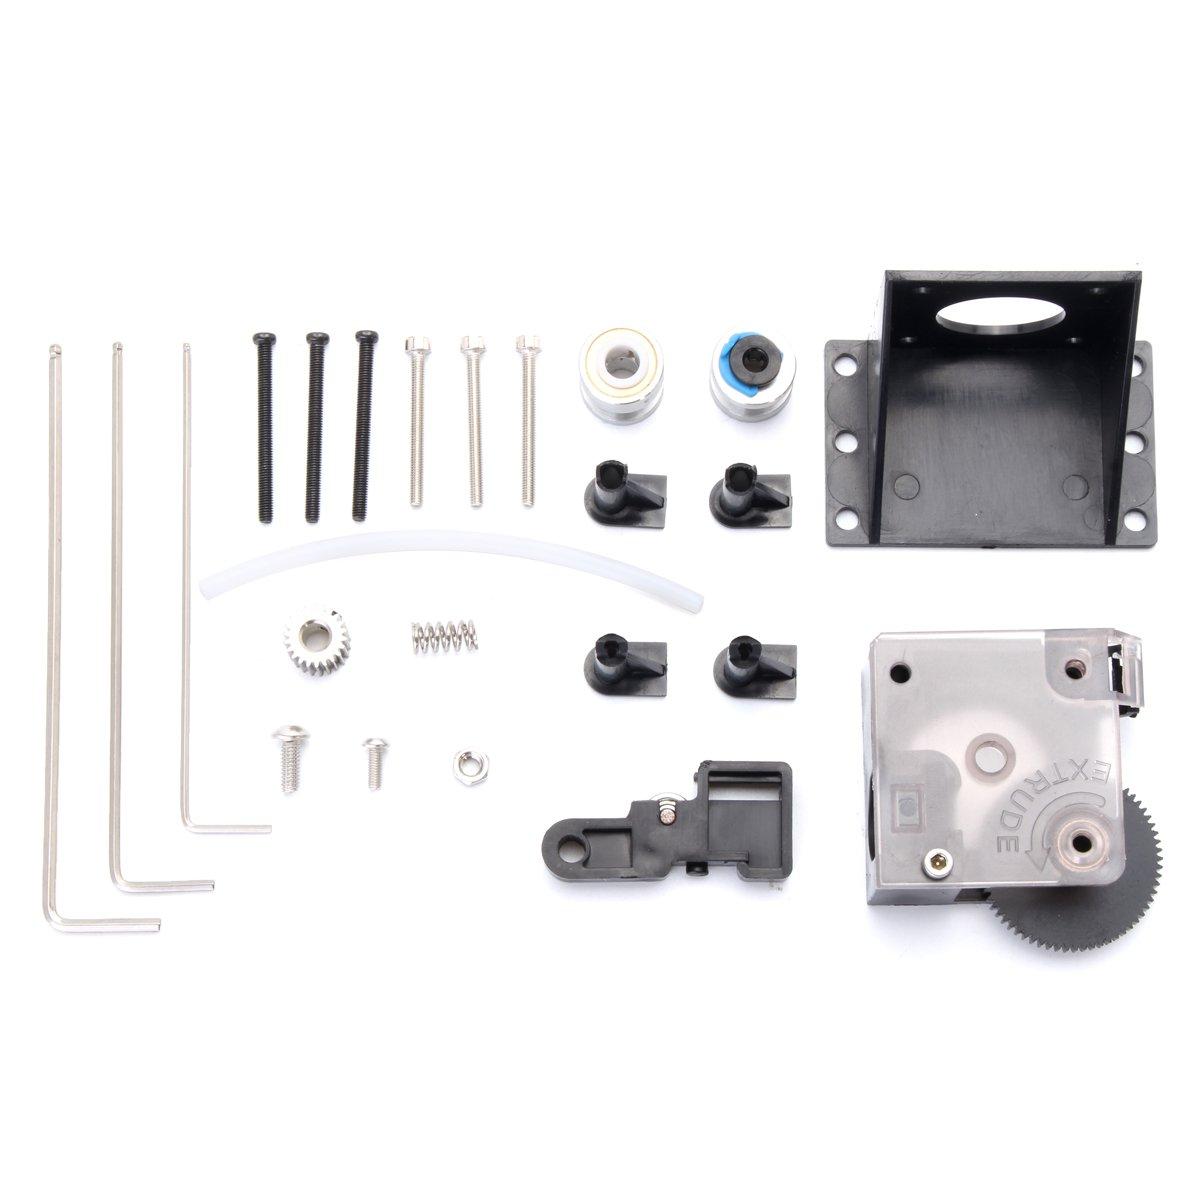 Kit de extrusor de titanio para impresora 3D de Hitsan para 1,75 ...